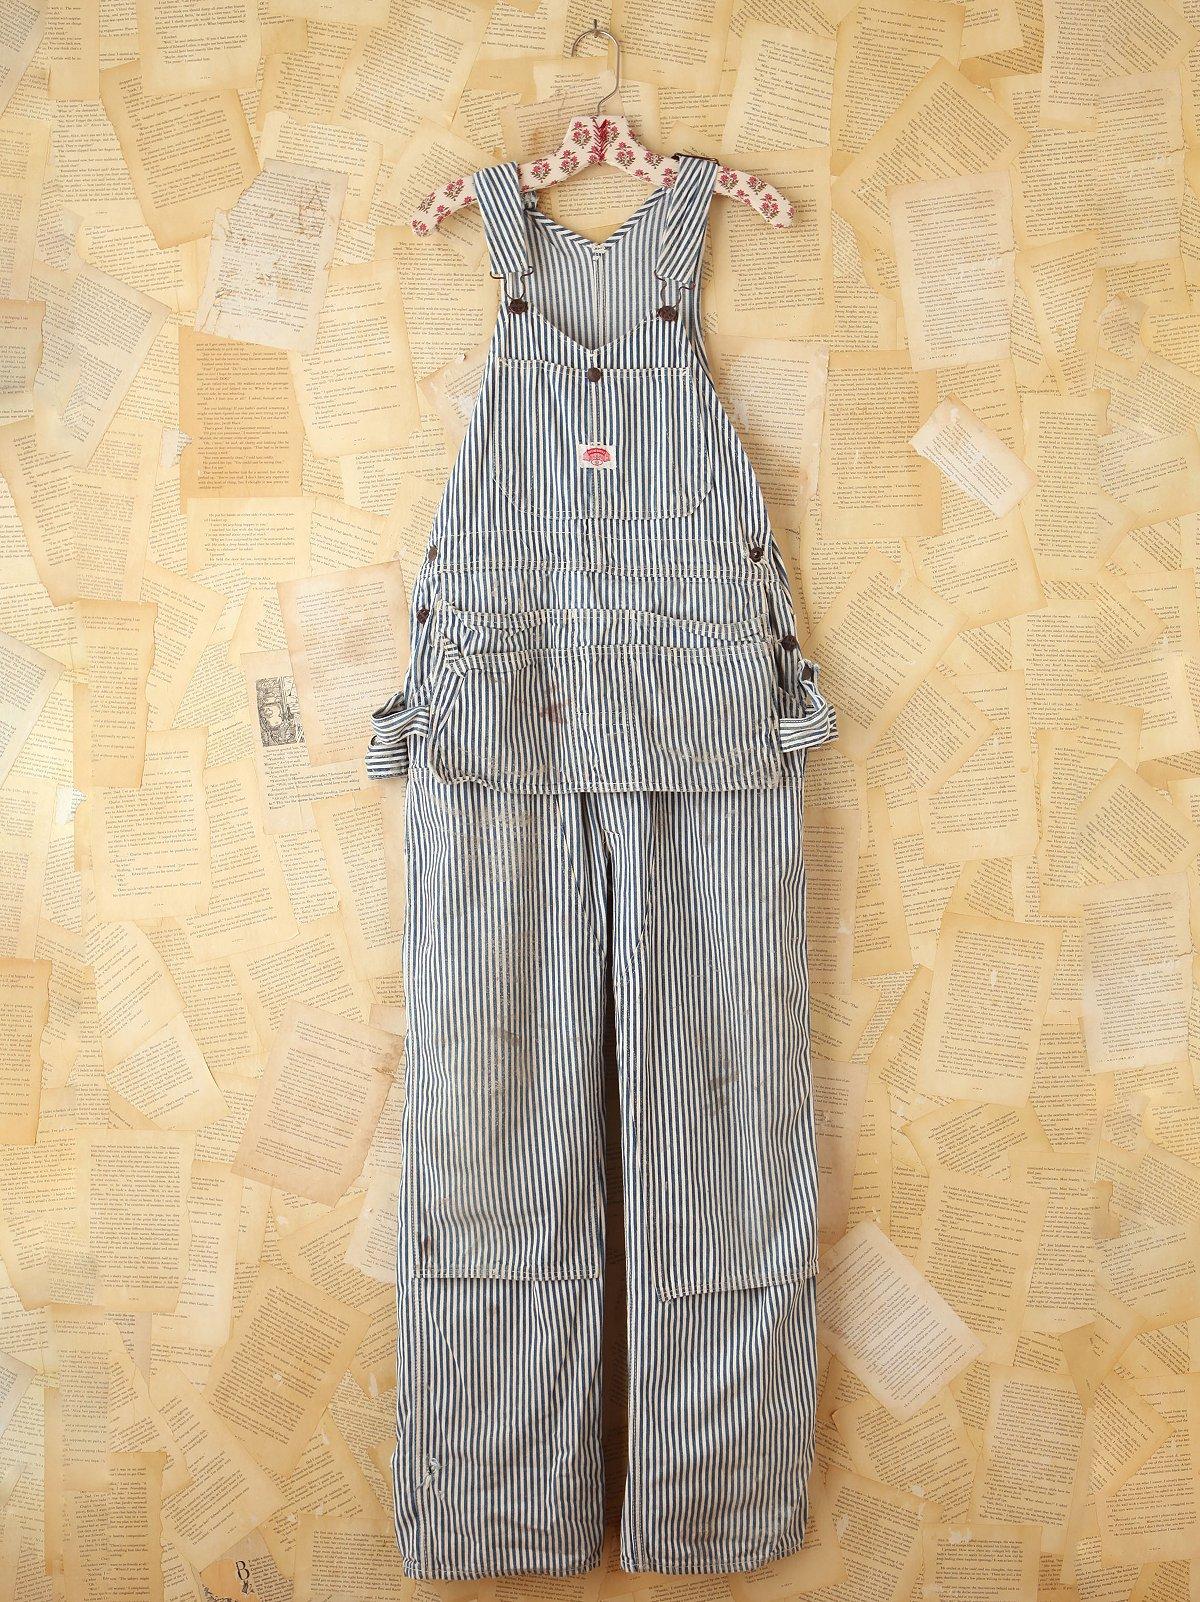 Vintage Thick Stripe Denim Overalls